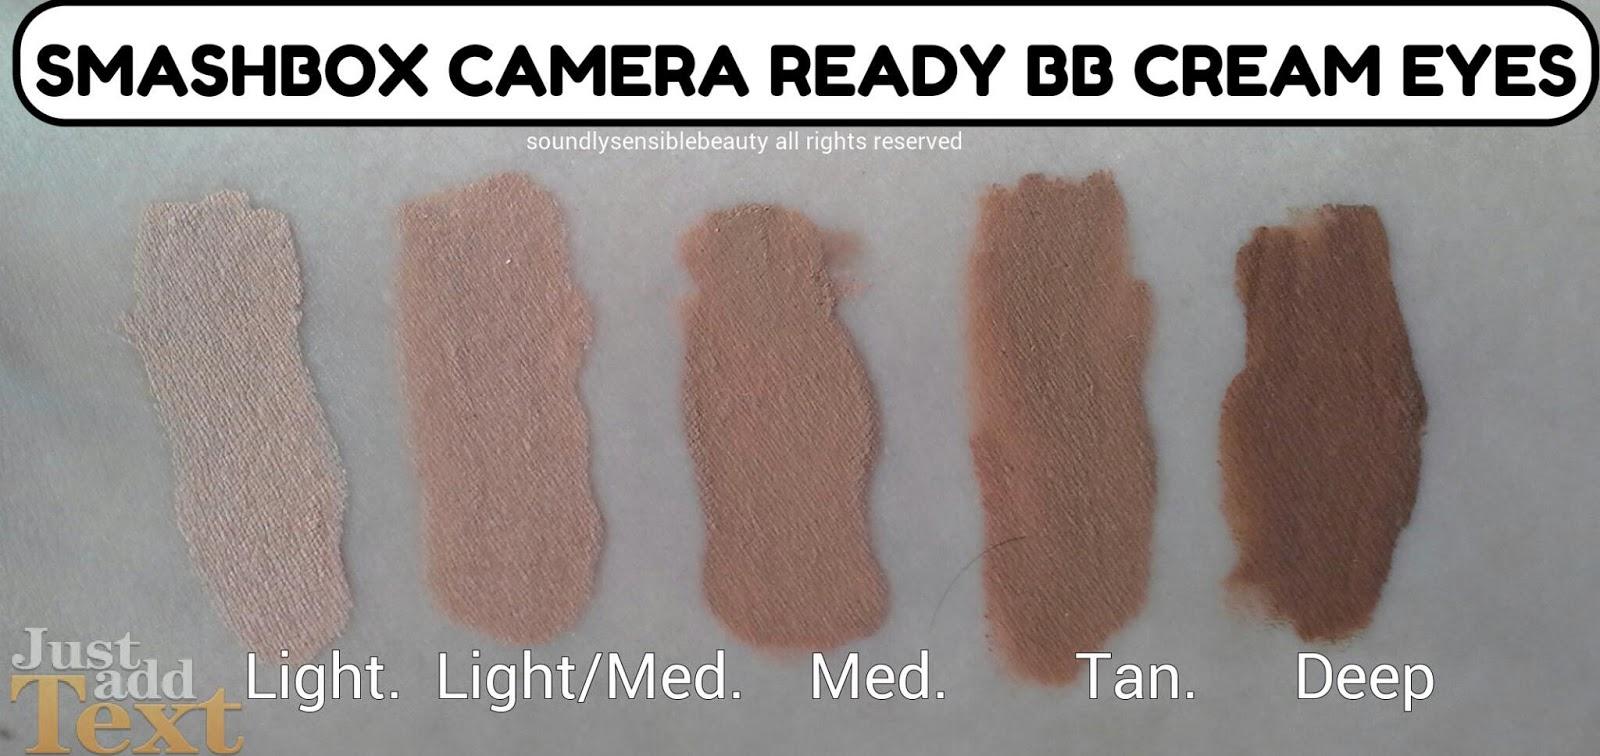 Camera Ready BB Cream by Smashbox #7